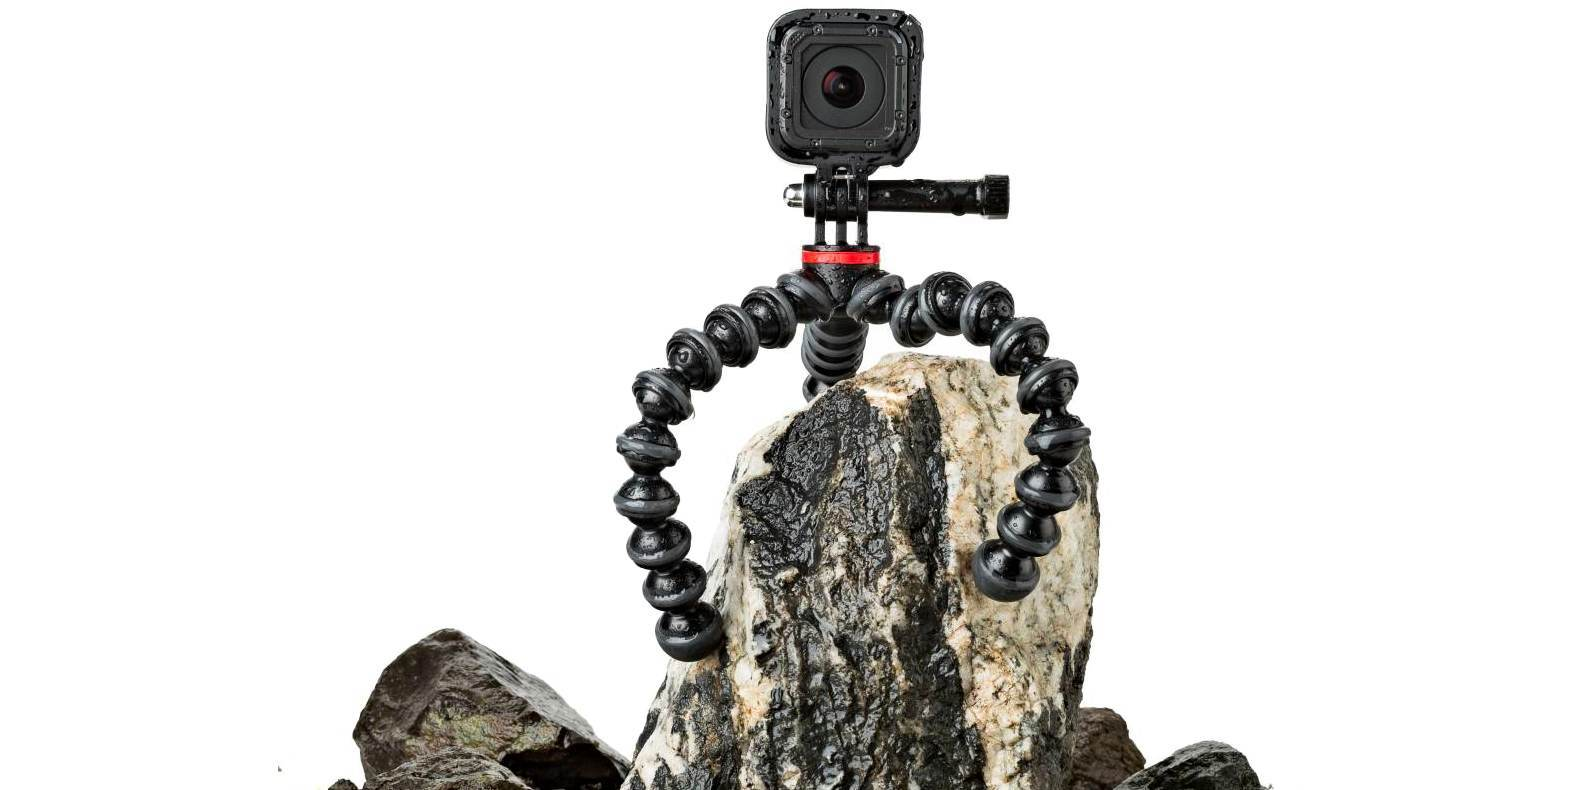 Штатив Joby GorillaPod 500 Action для фото- и GoPro камер с Session